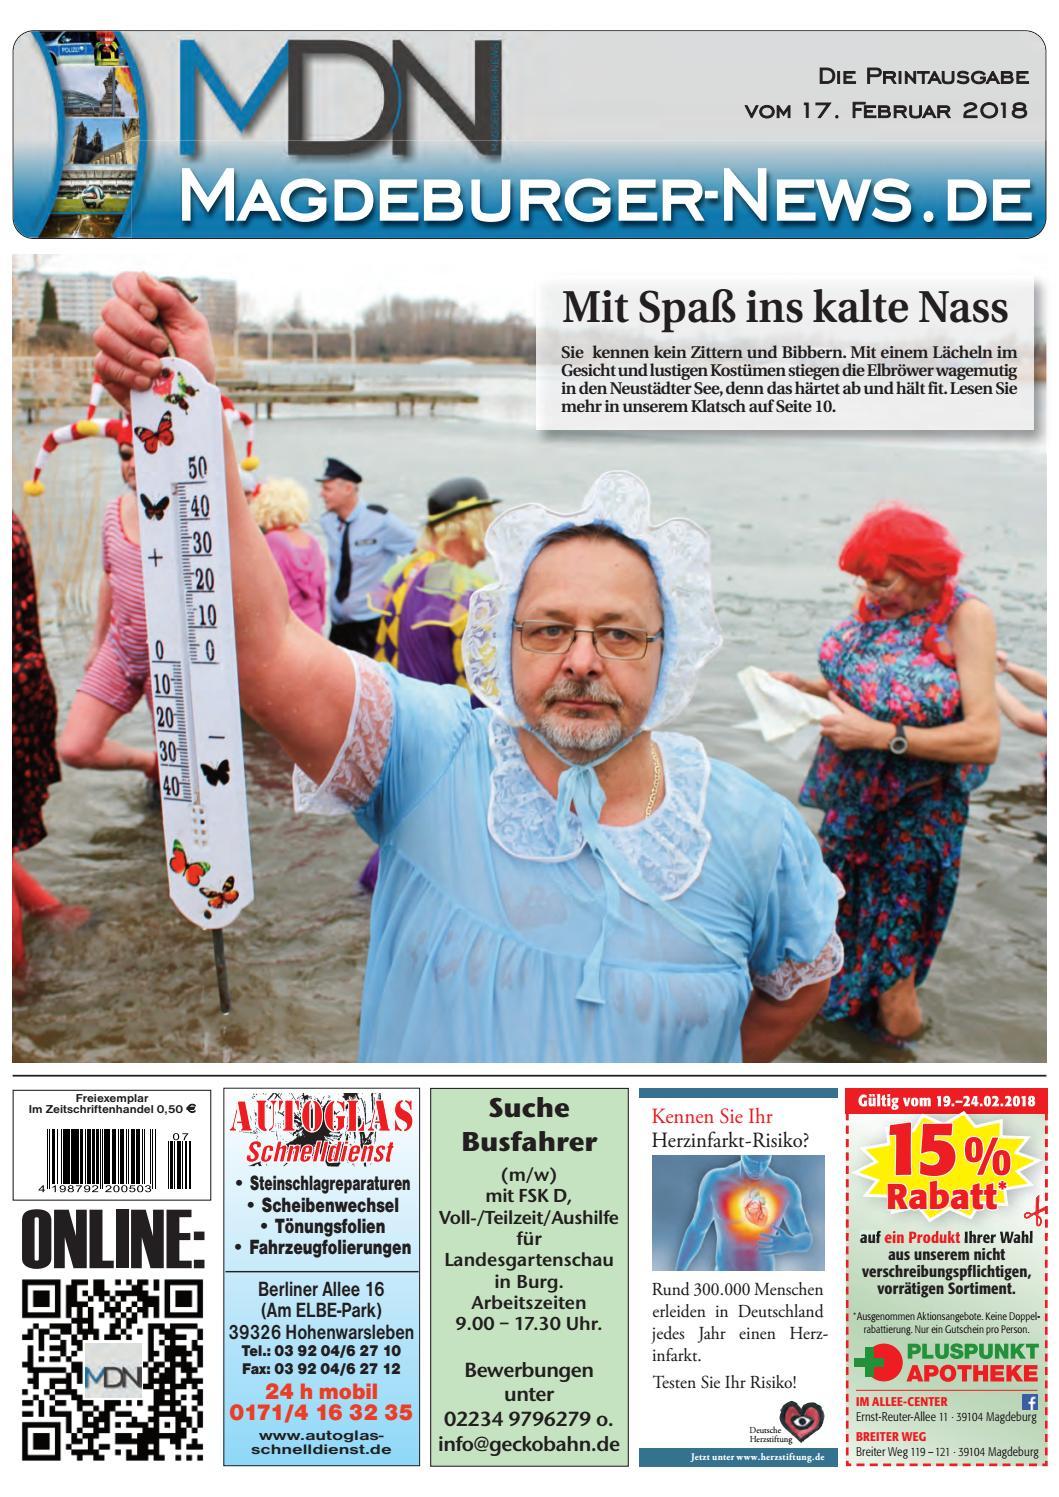 Magdeburger Newsde By Mdnews18 Issuu